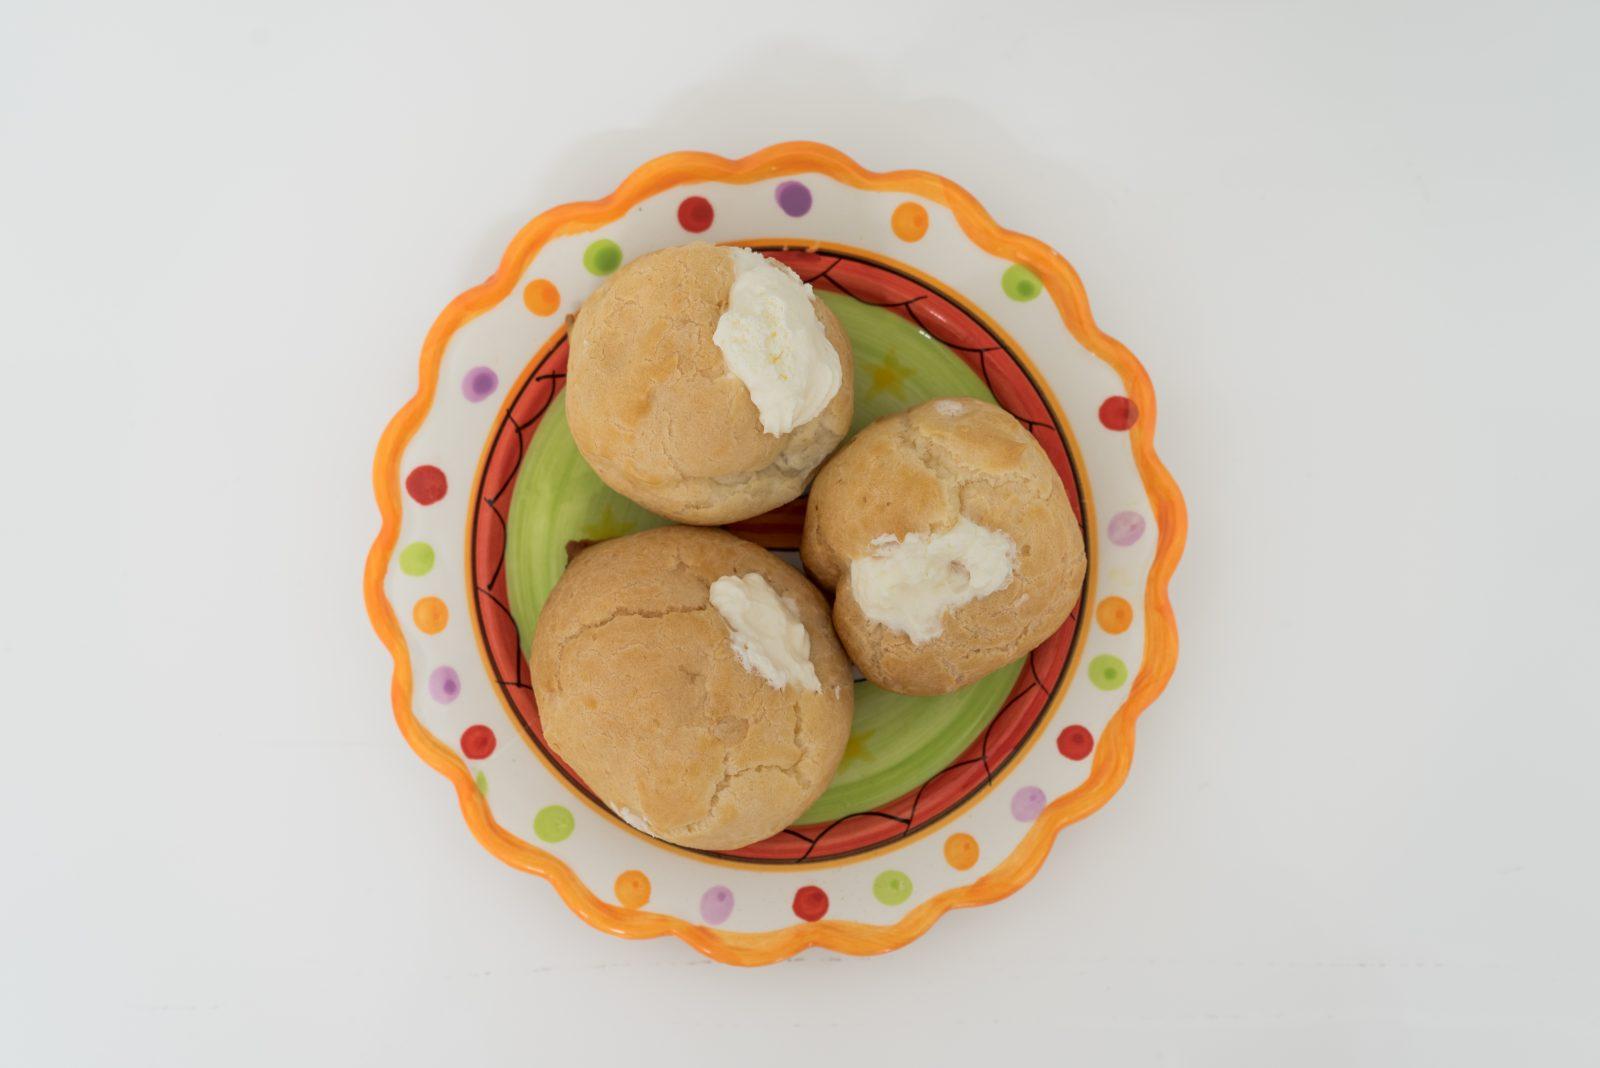 recept slagroomsoes met chocoladesaus